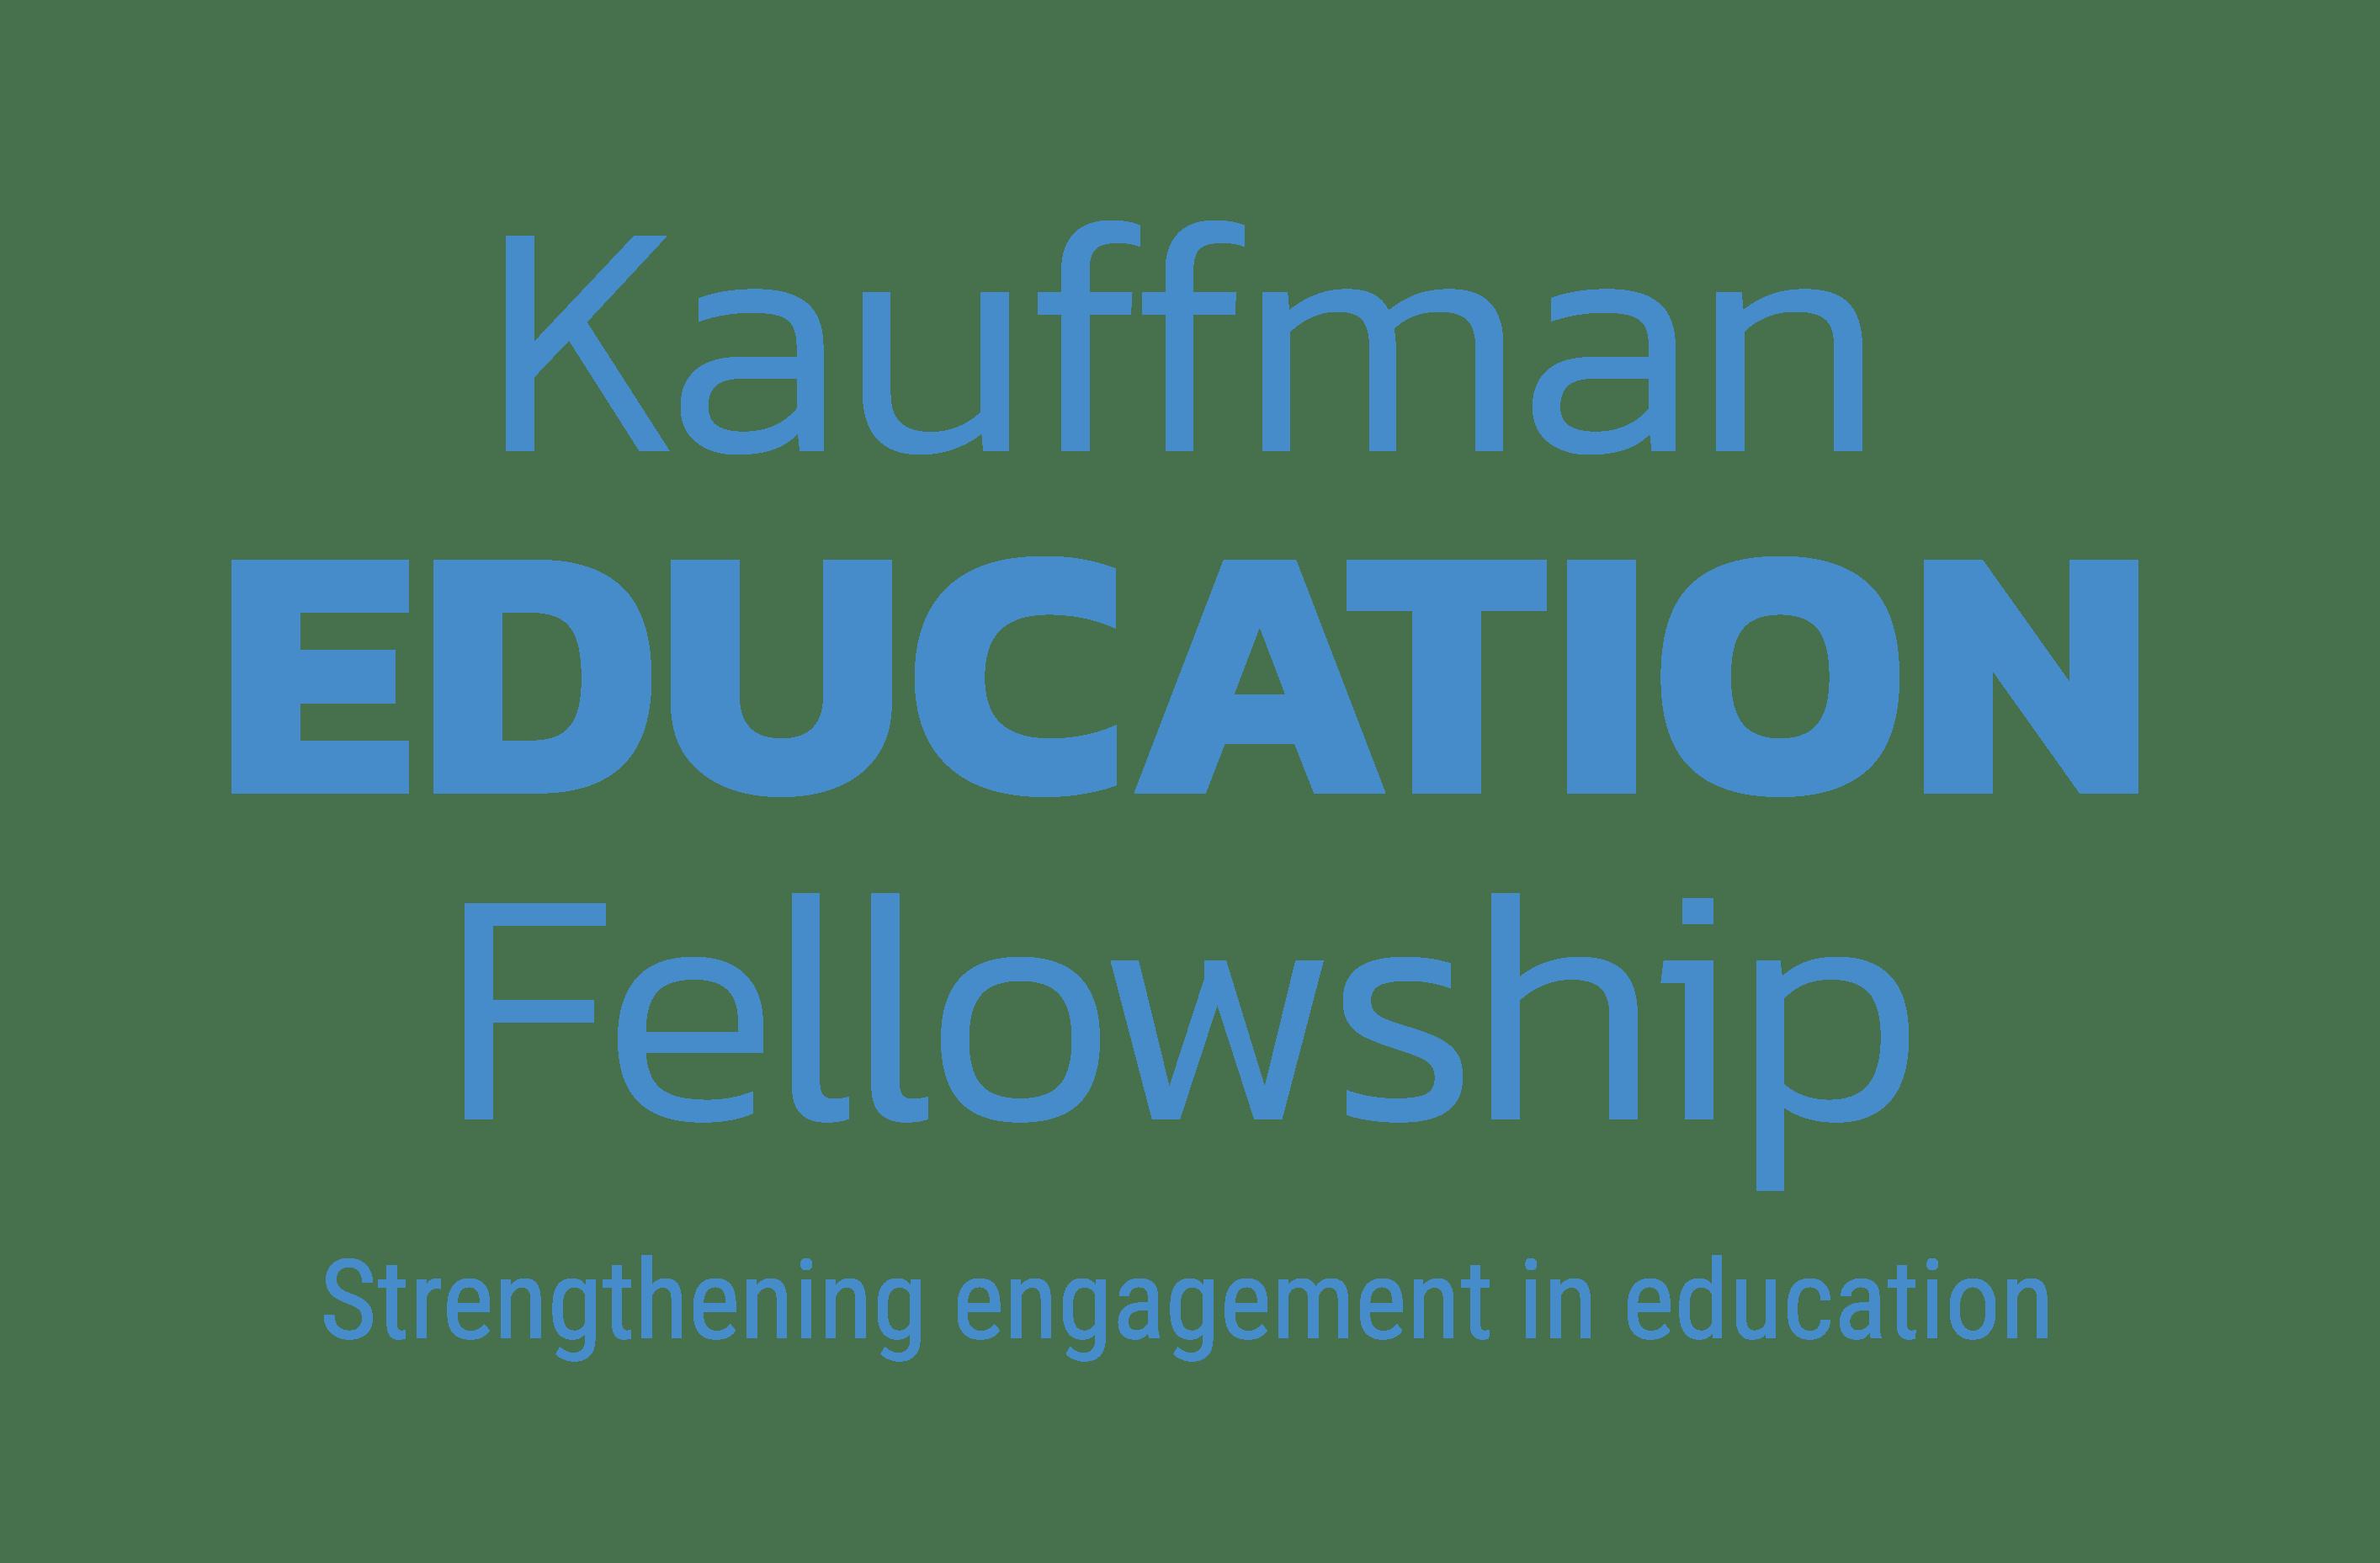 Kauffman Education Fellowship